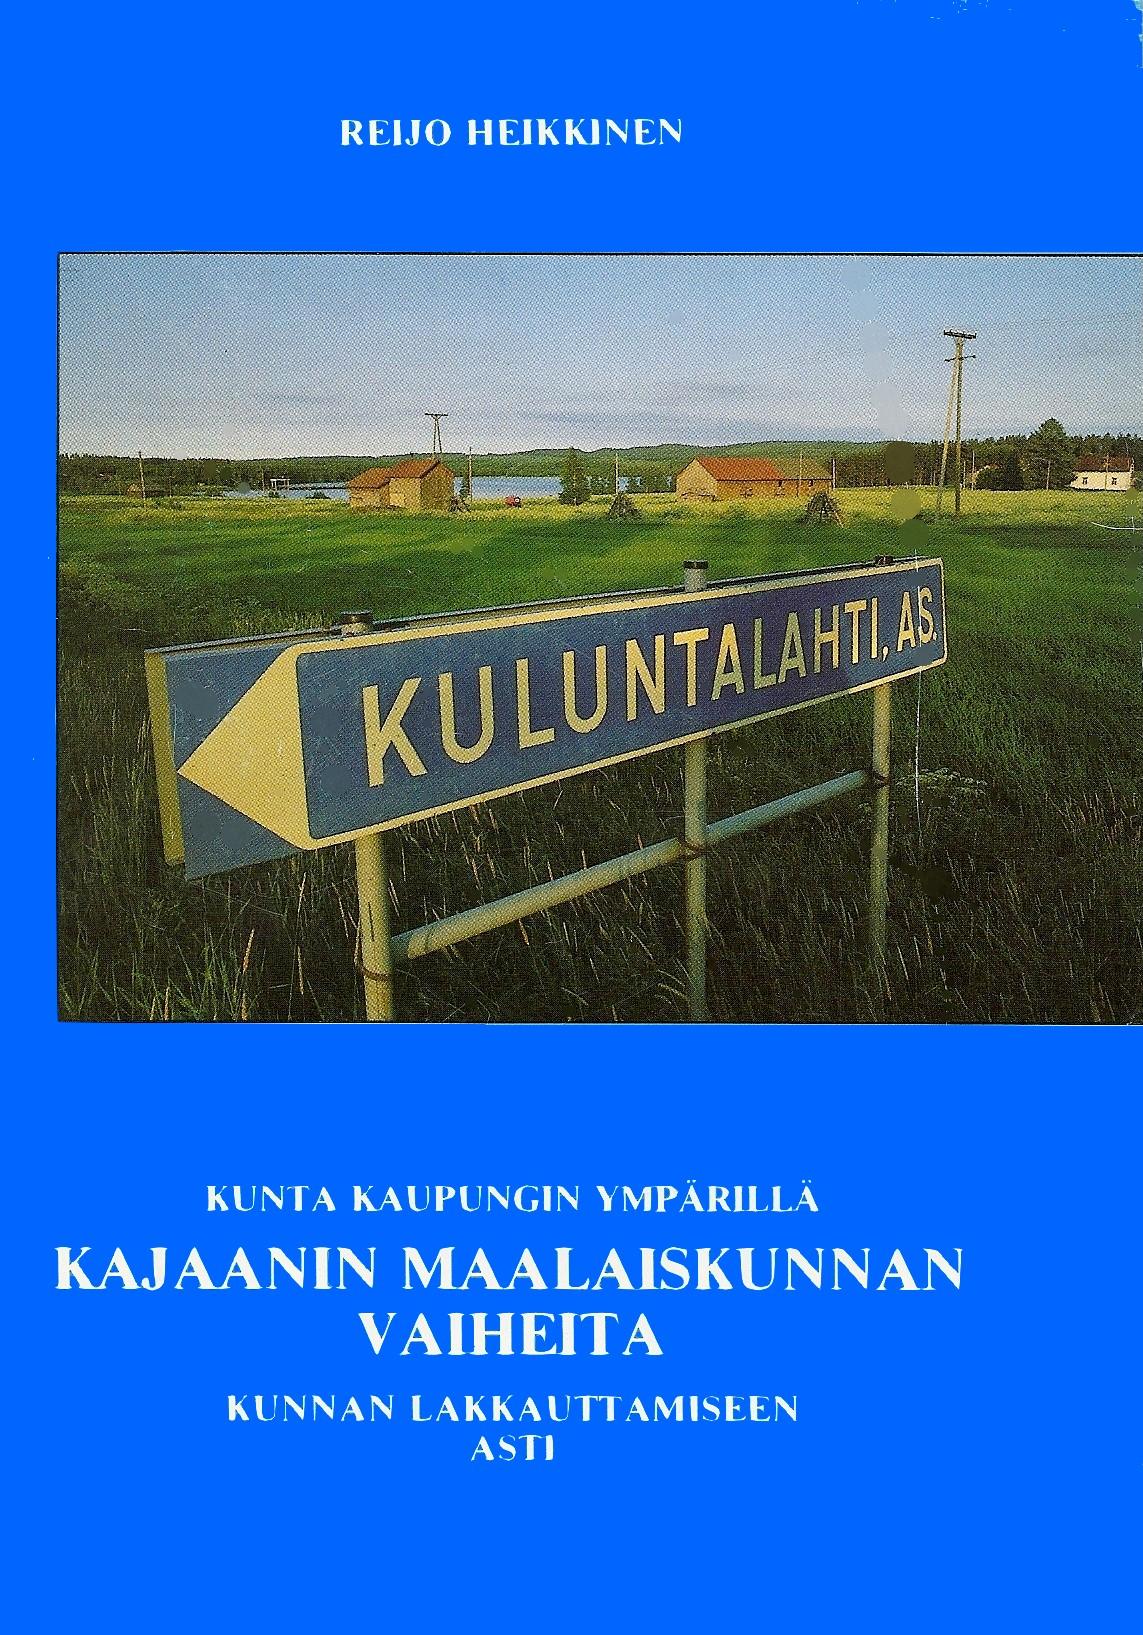 Kajaanin maalaiskunnan historia 1984